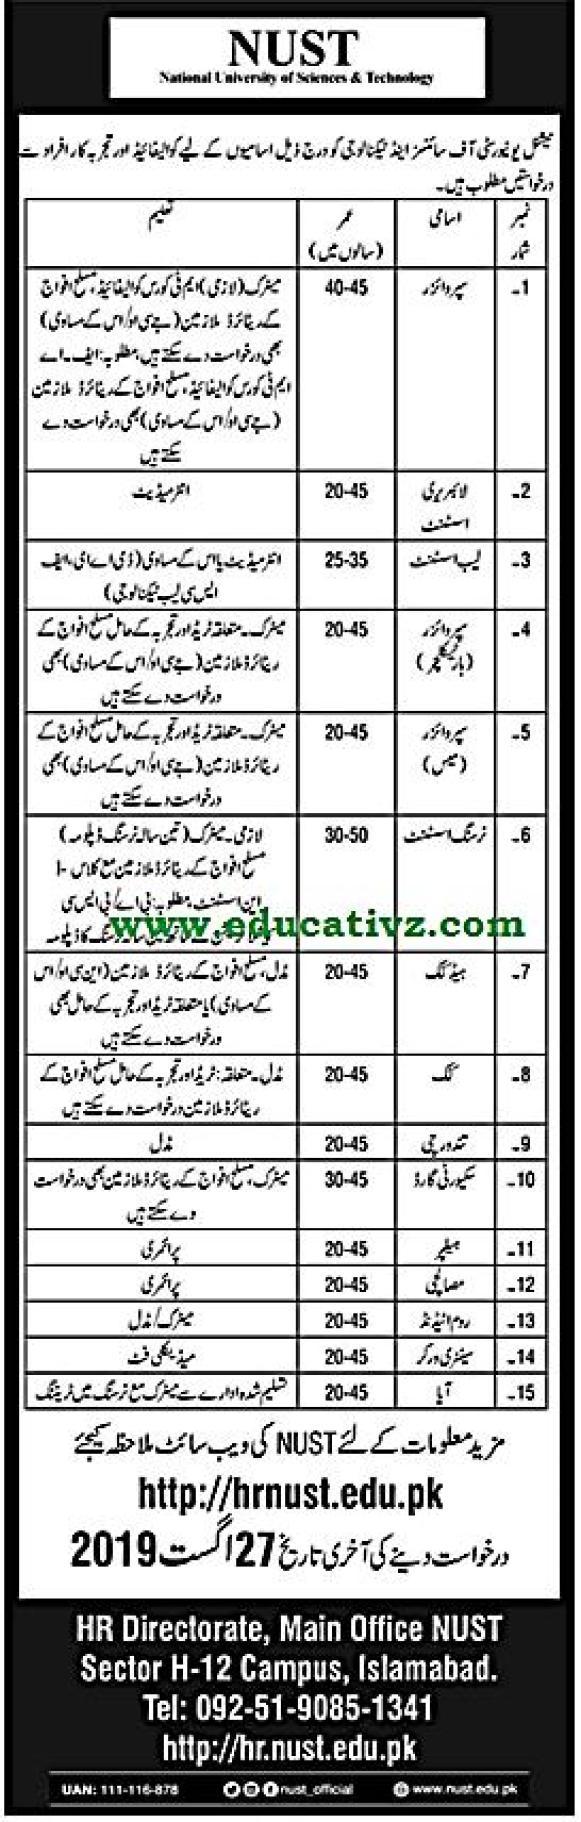 NUST University Jobs 2019 Islamabad - Educational Learning Point